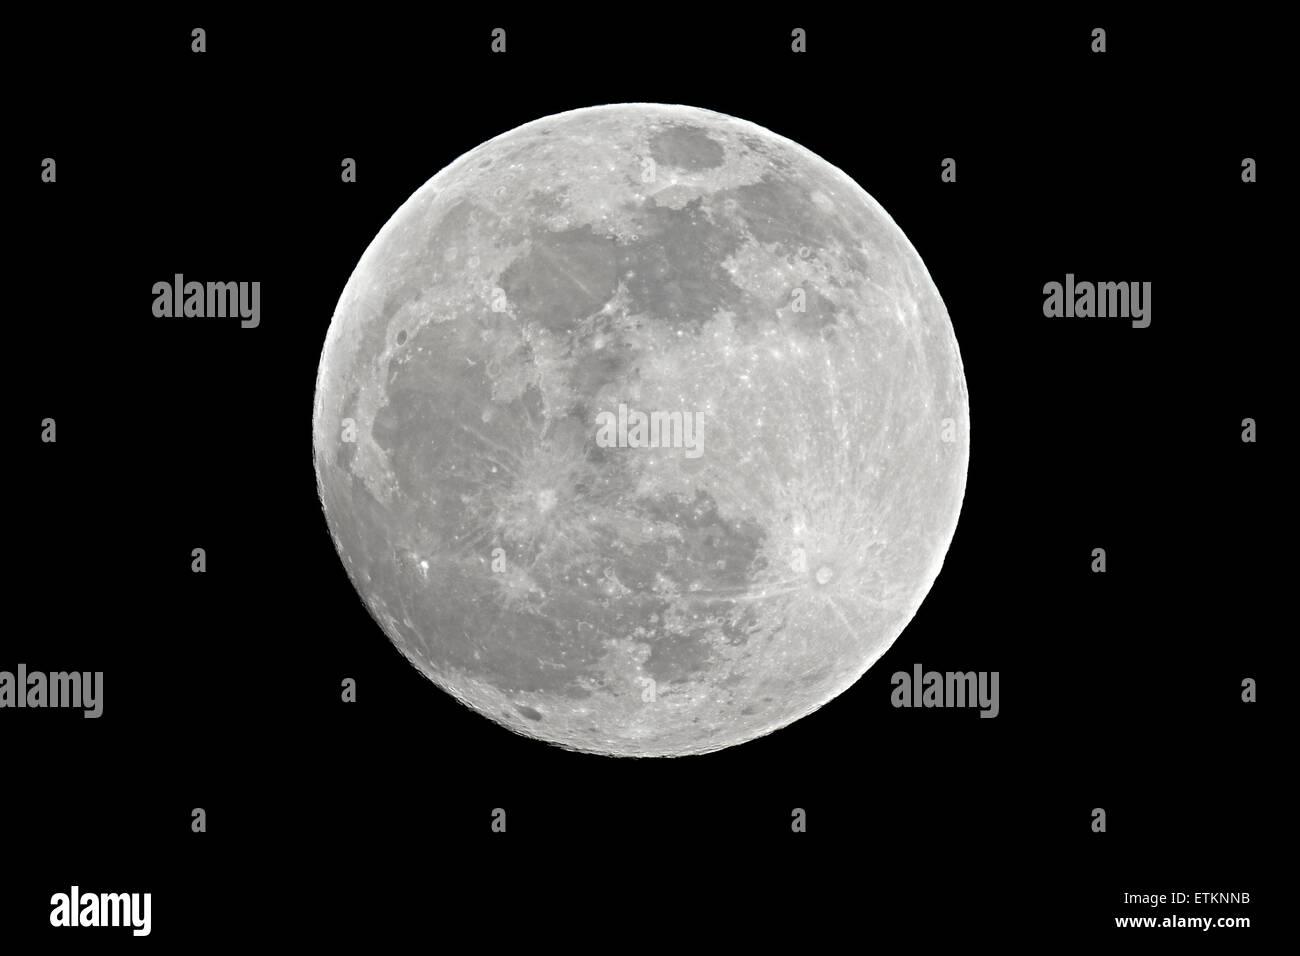 Pleine lune closeup Photo Stock